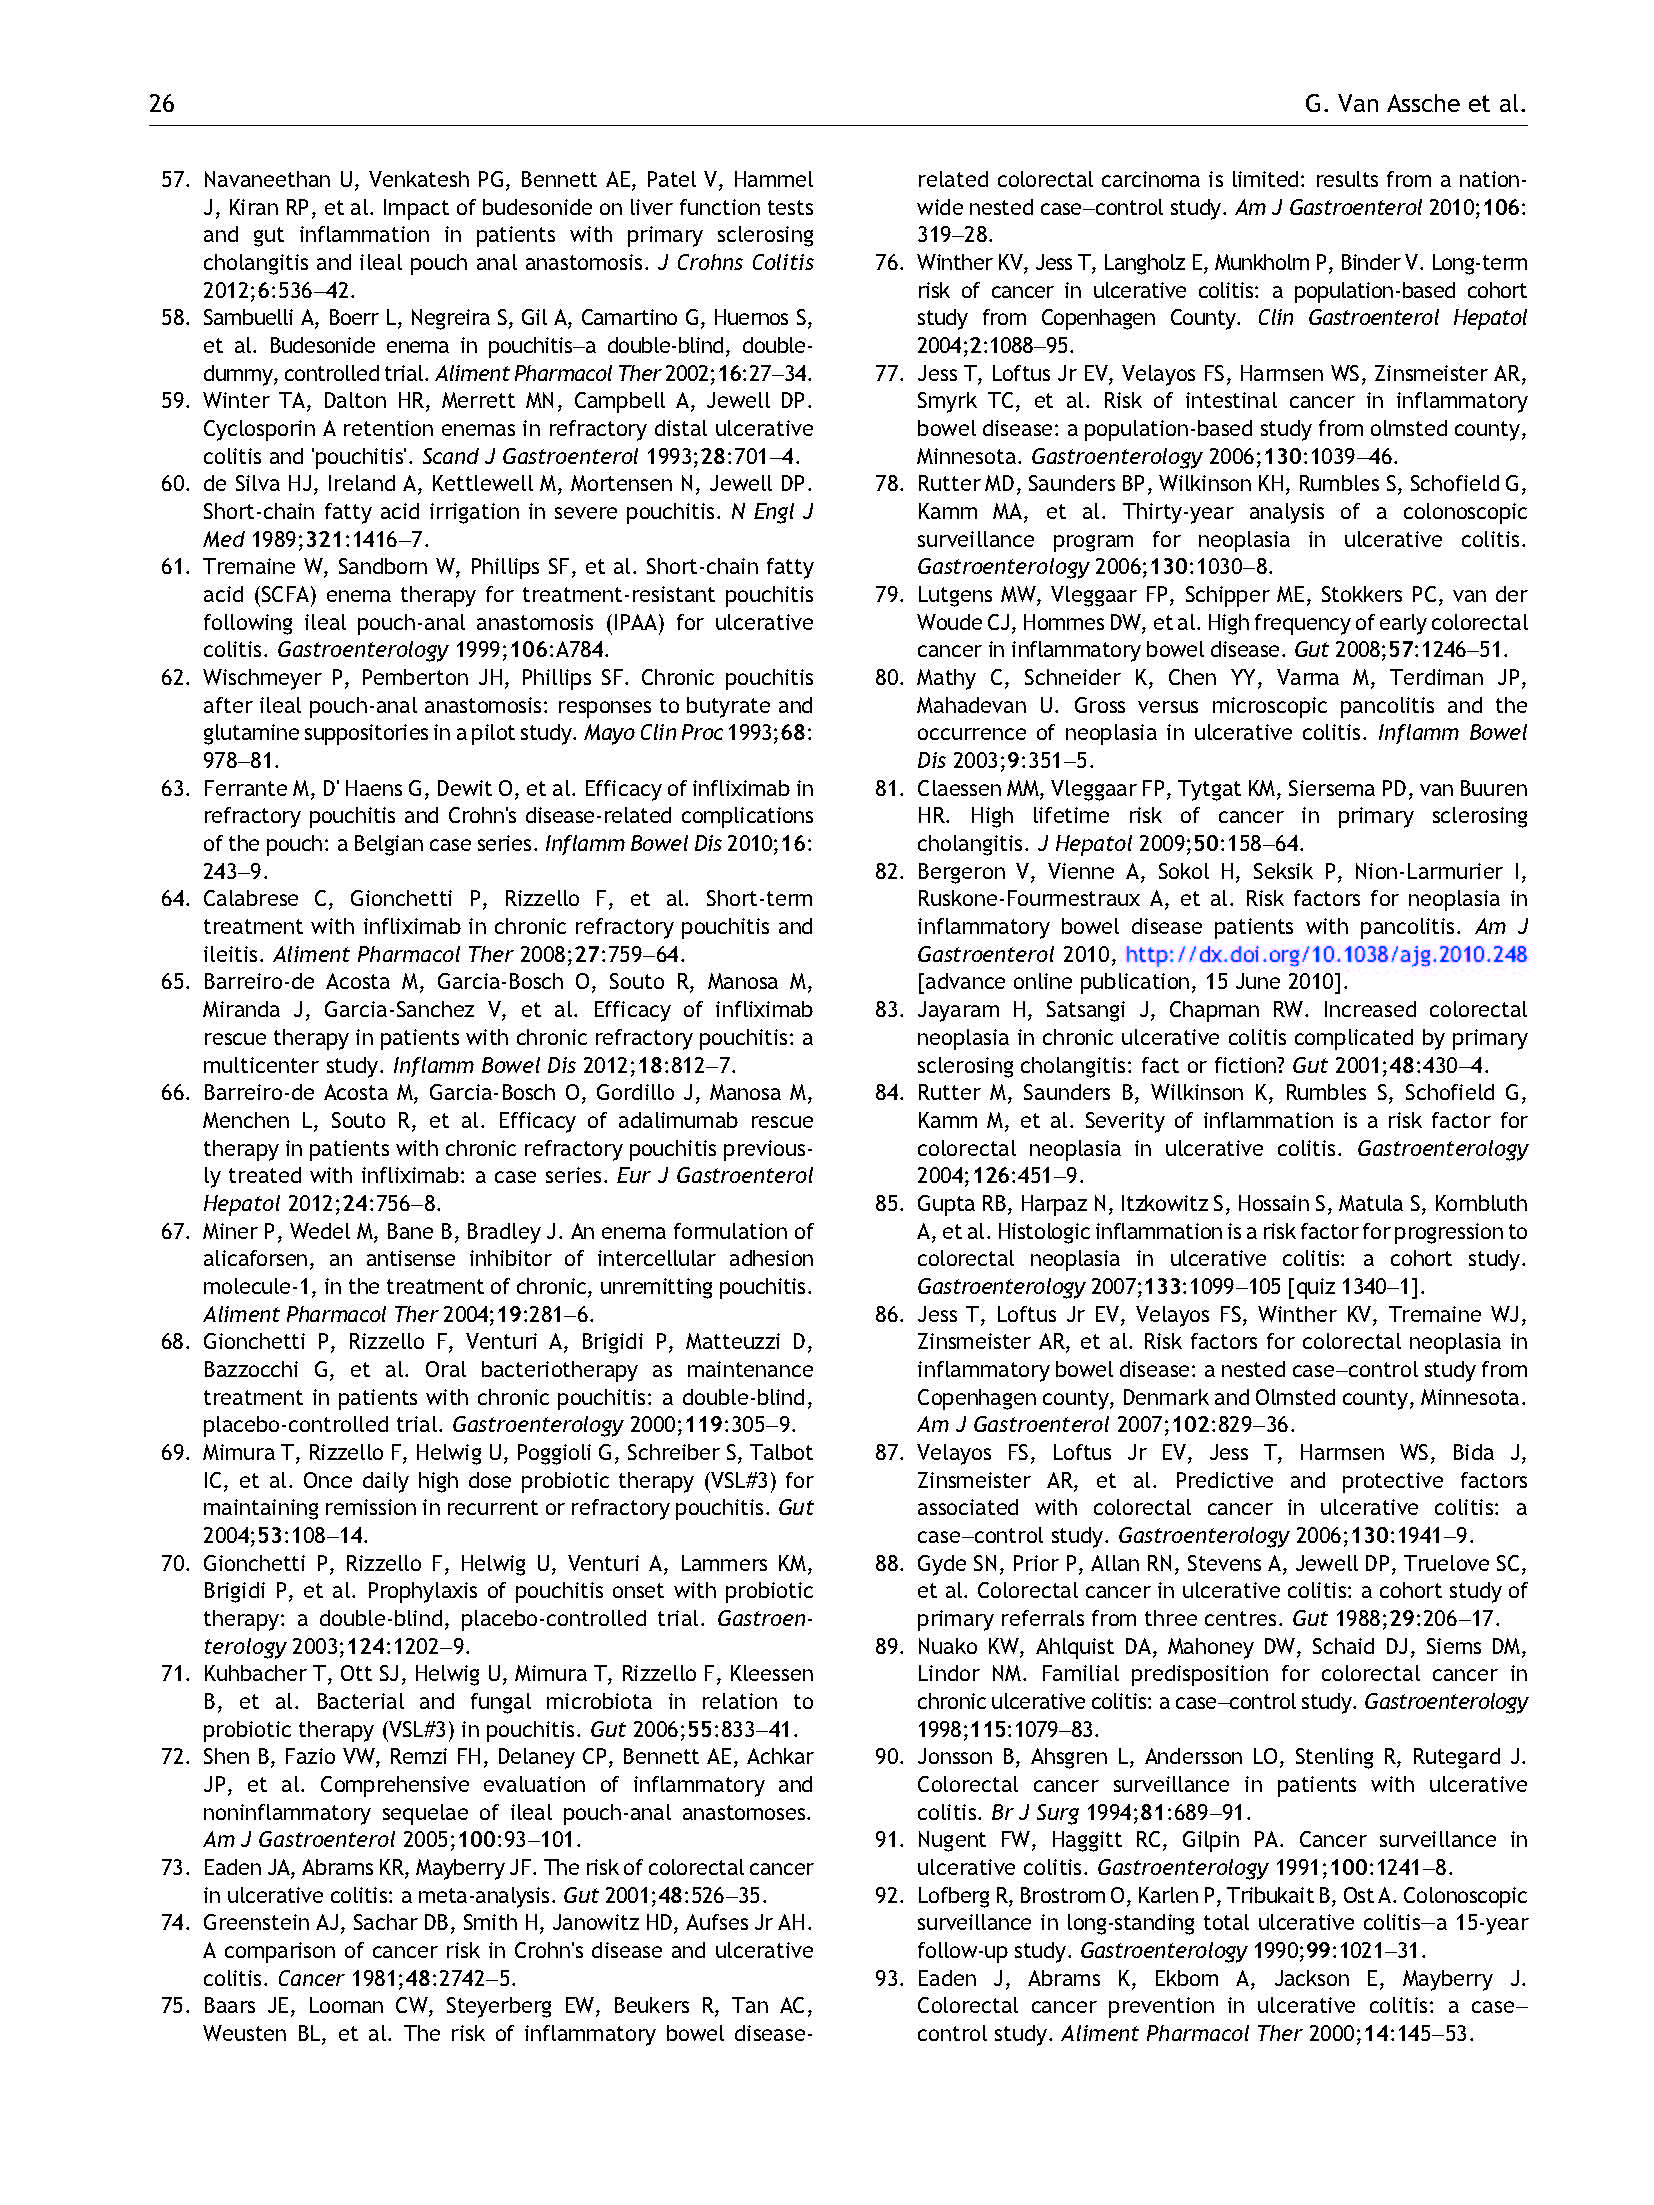 2012-ECCO第二版-欧洲询证共识:溃疡性结肠炎的诊断和处理—特殊情况_页面_26.jpg